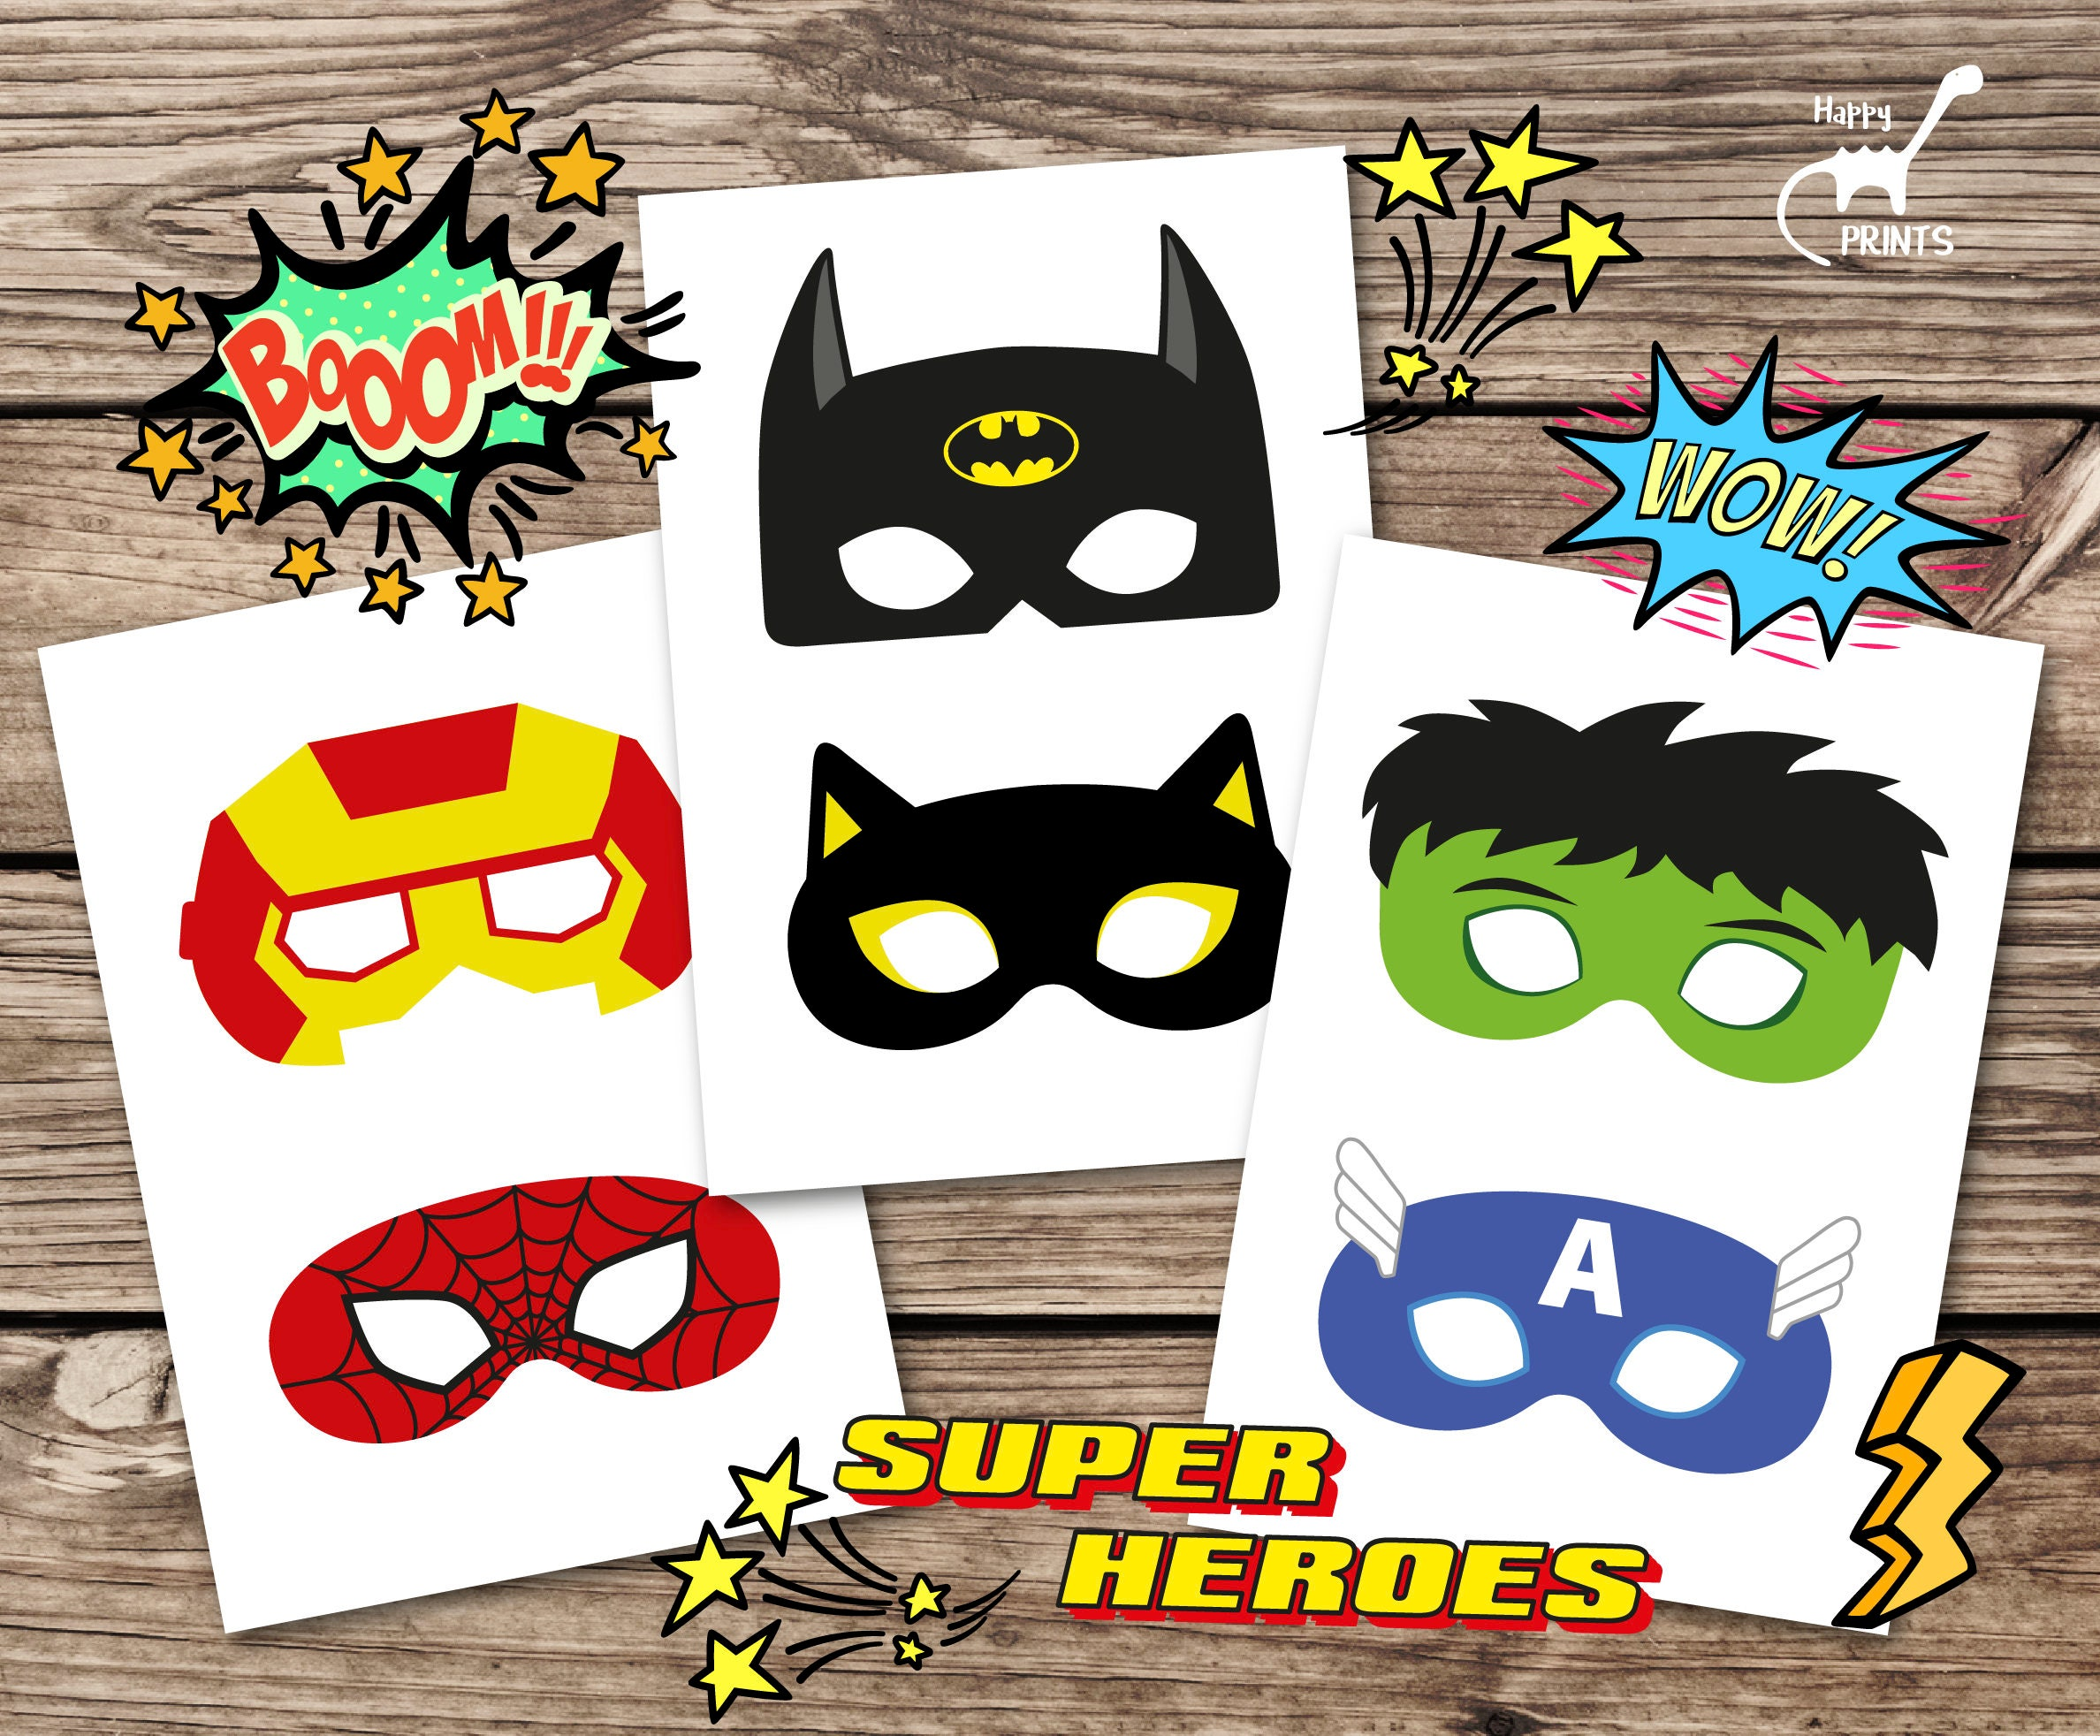 Uncategorized Printable Superheros superhero masks hero printable